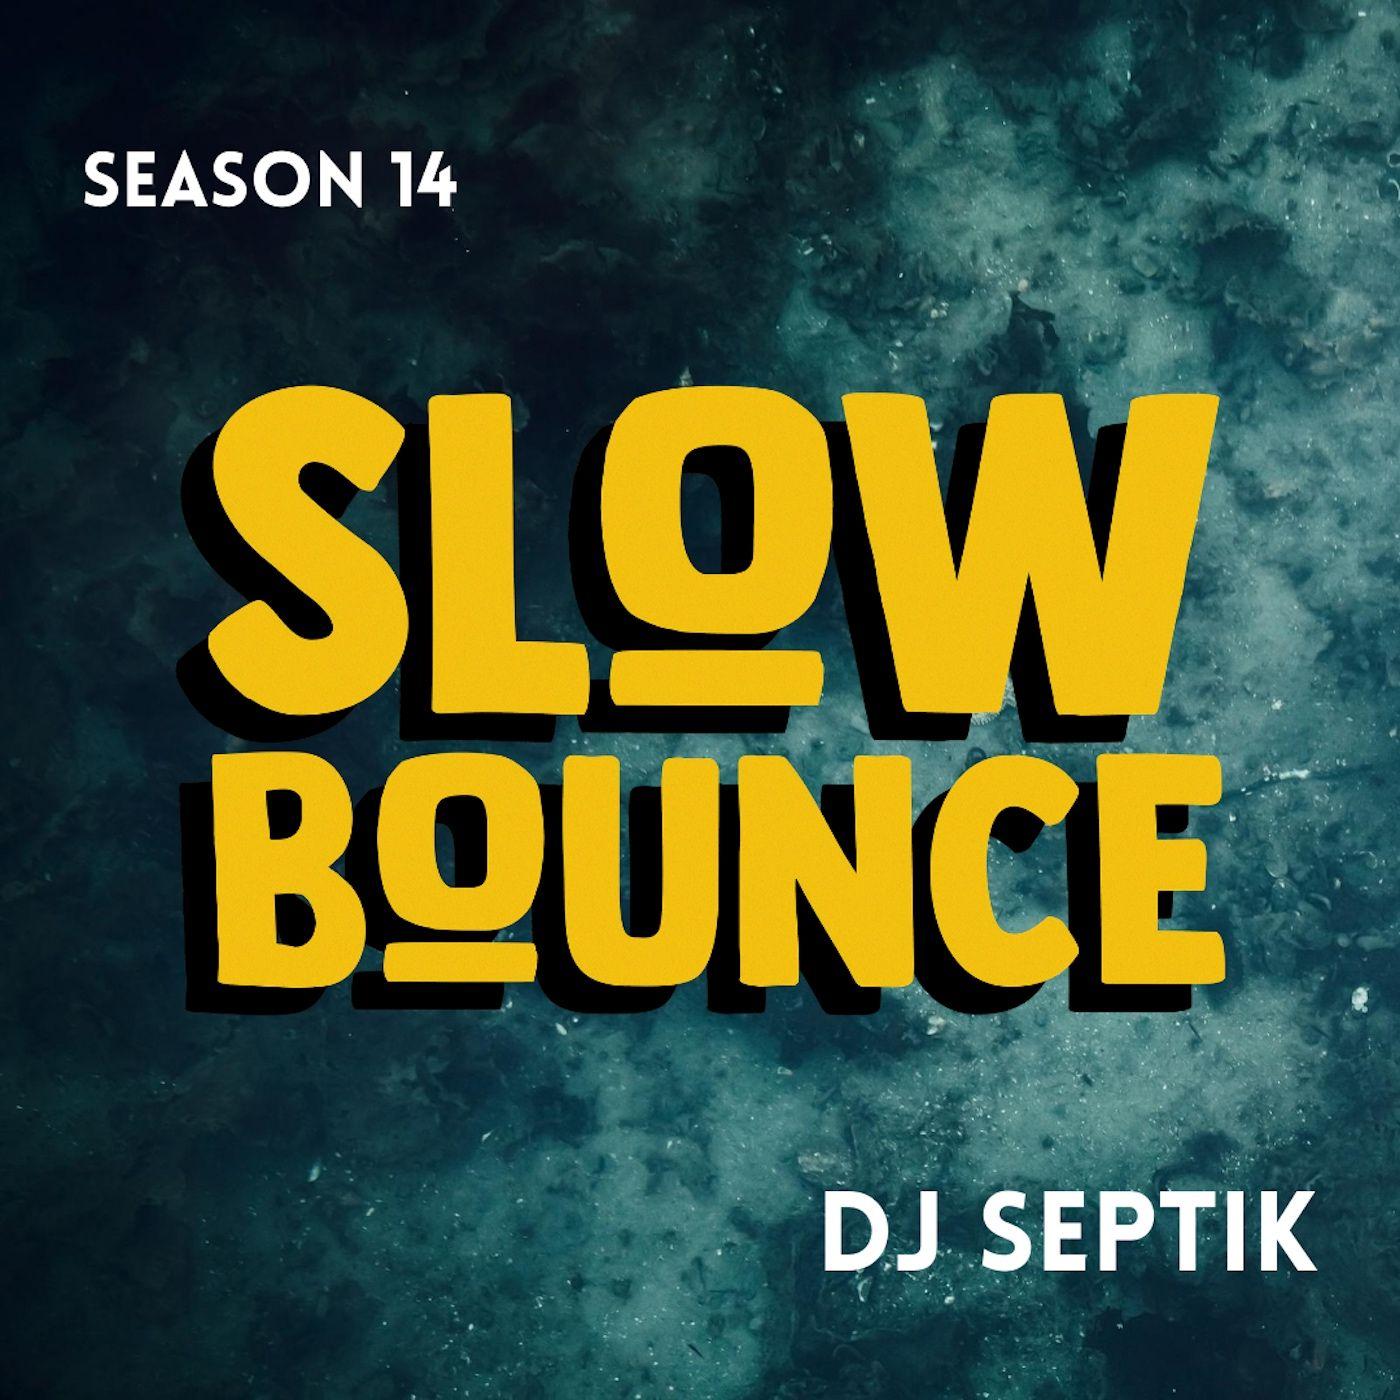 SLOWBOUNCE | Dancehall, Moombahton, Reggae | Dj Septik